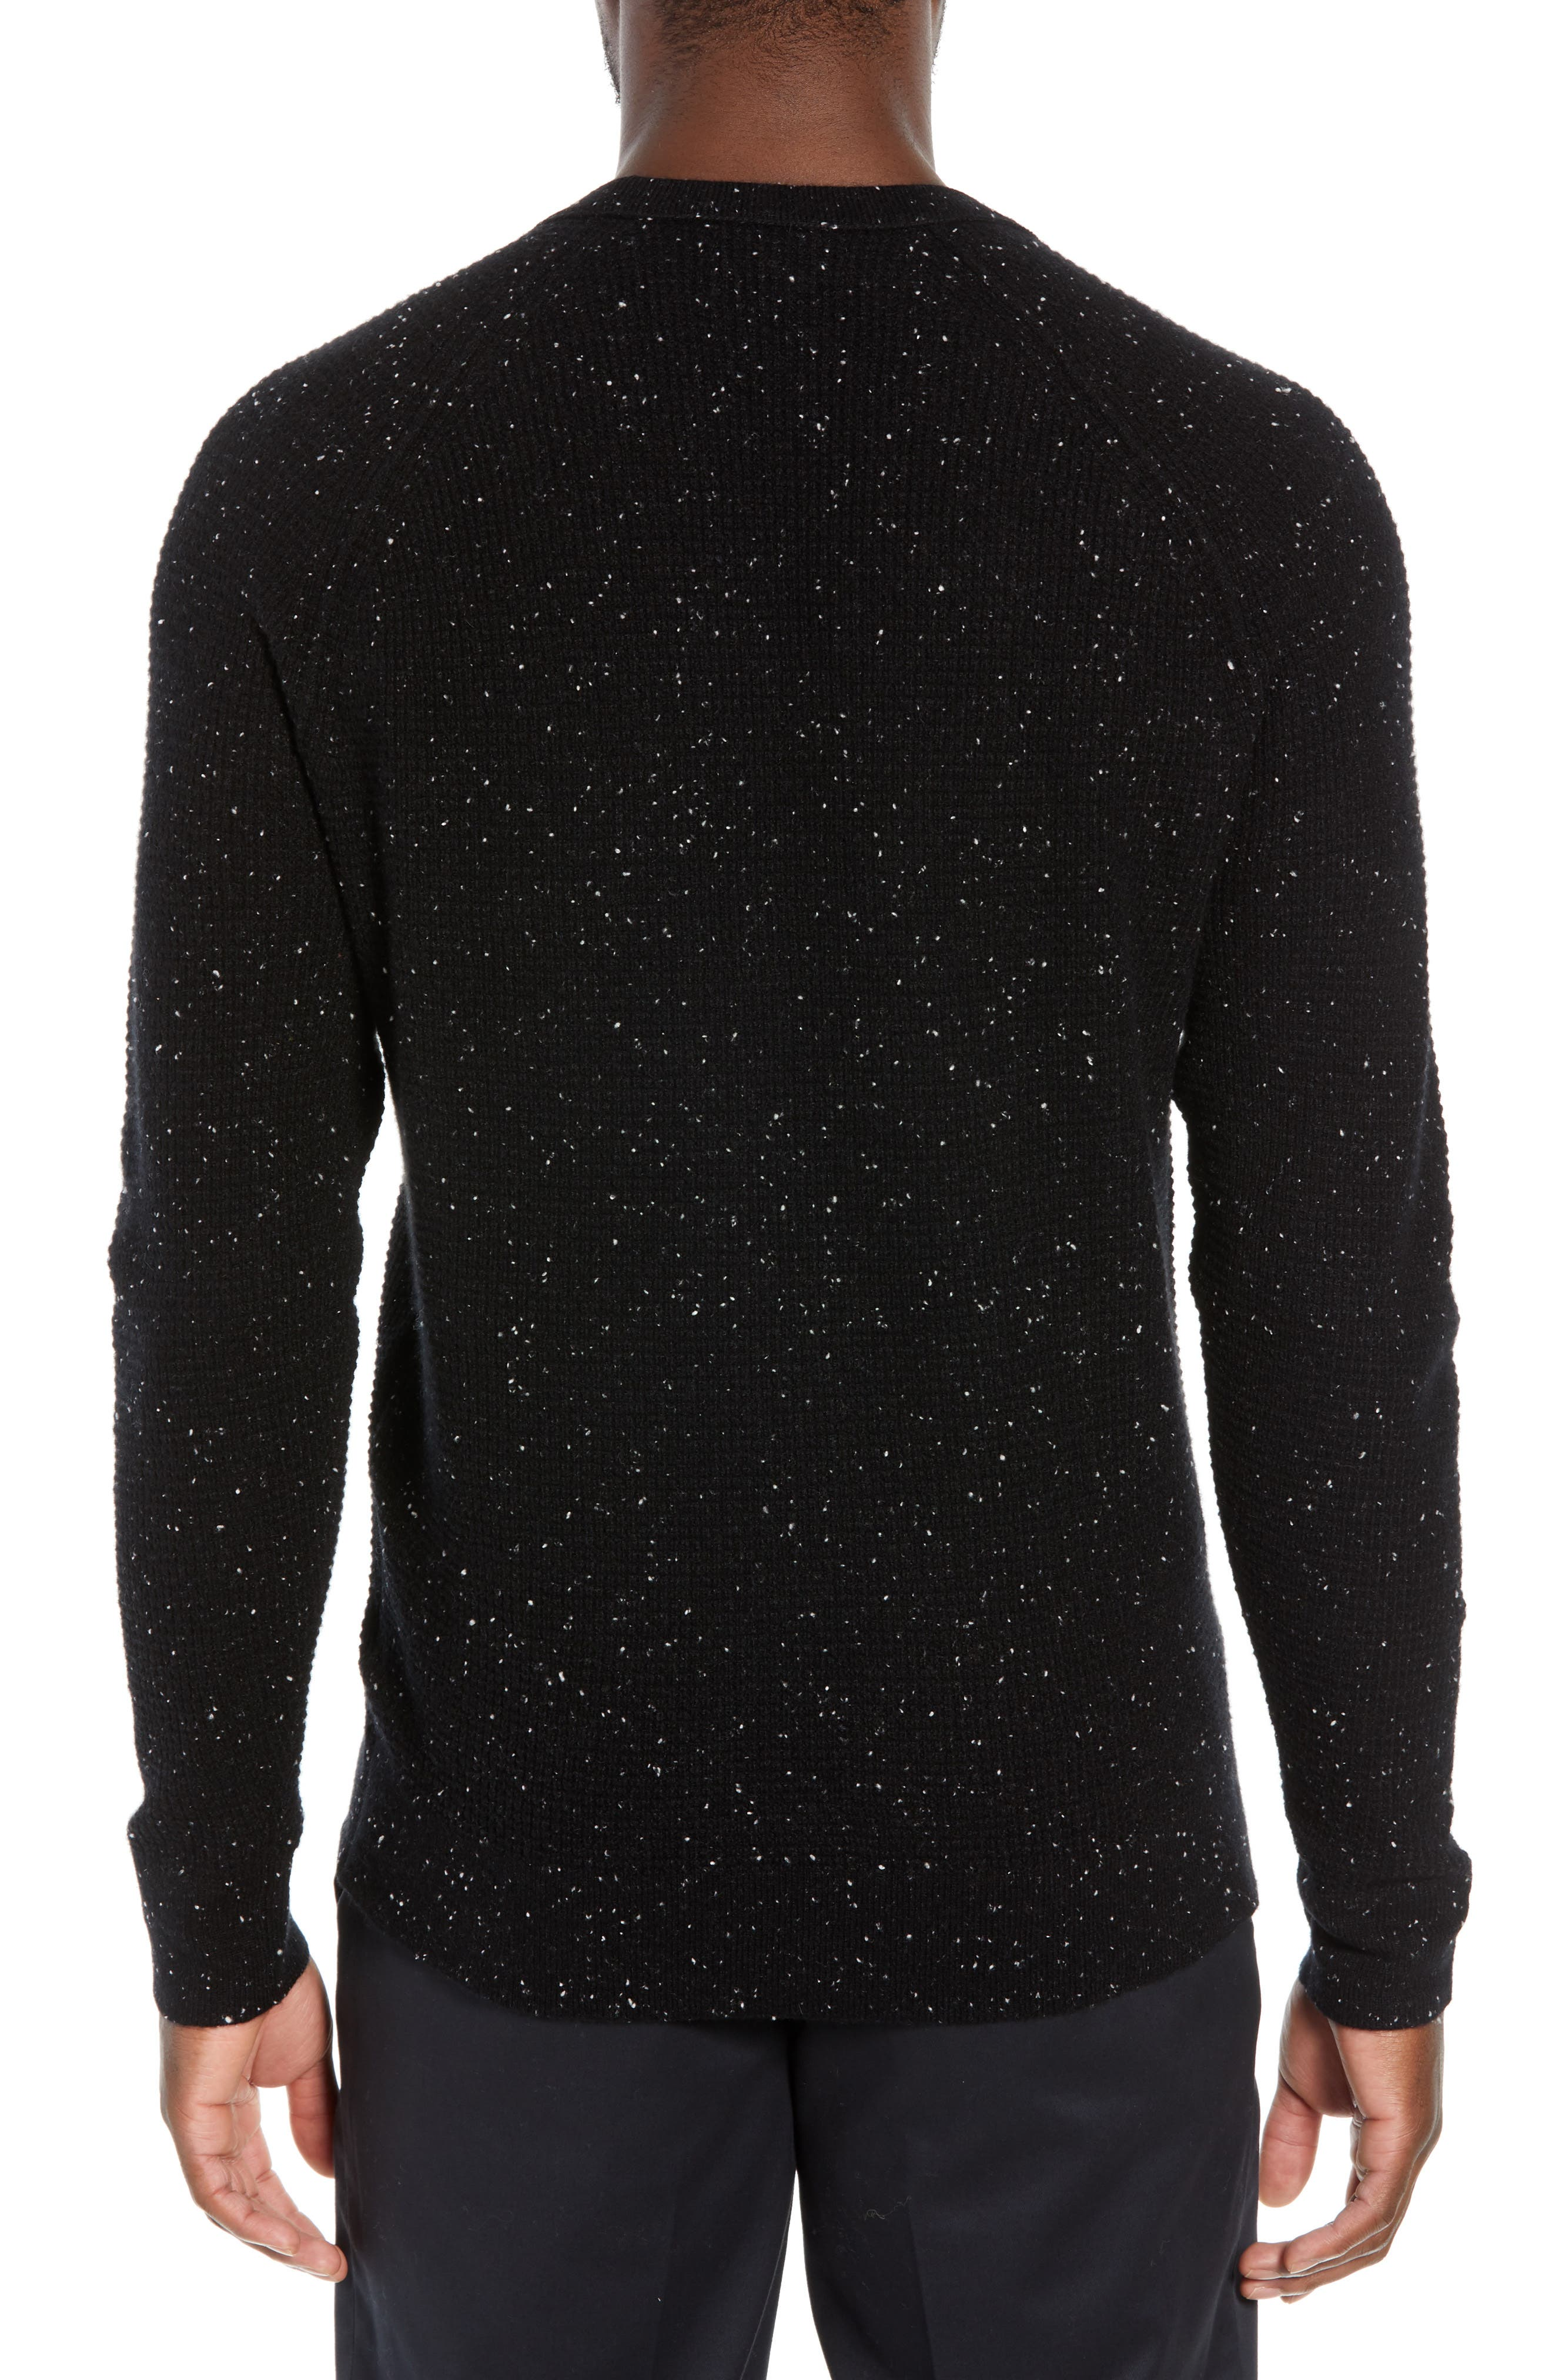 BONOBOS,                             Slim Fit Cashmere Sweater,                             Alternate thumbnail 2, color,                             001